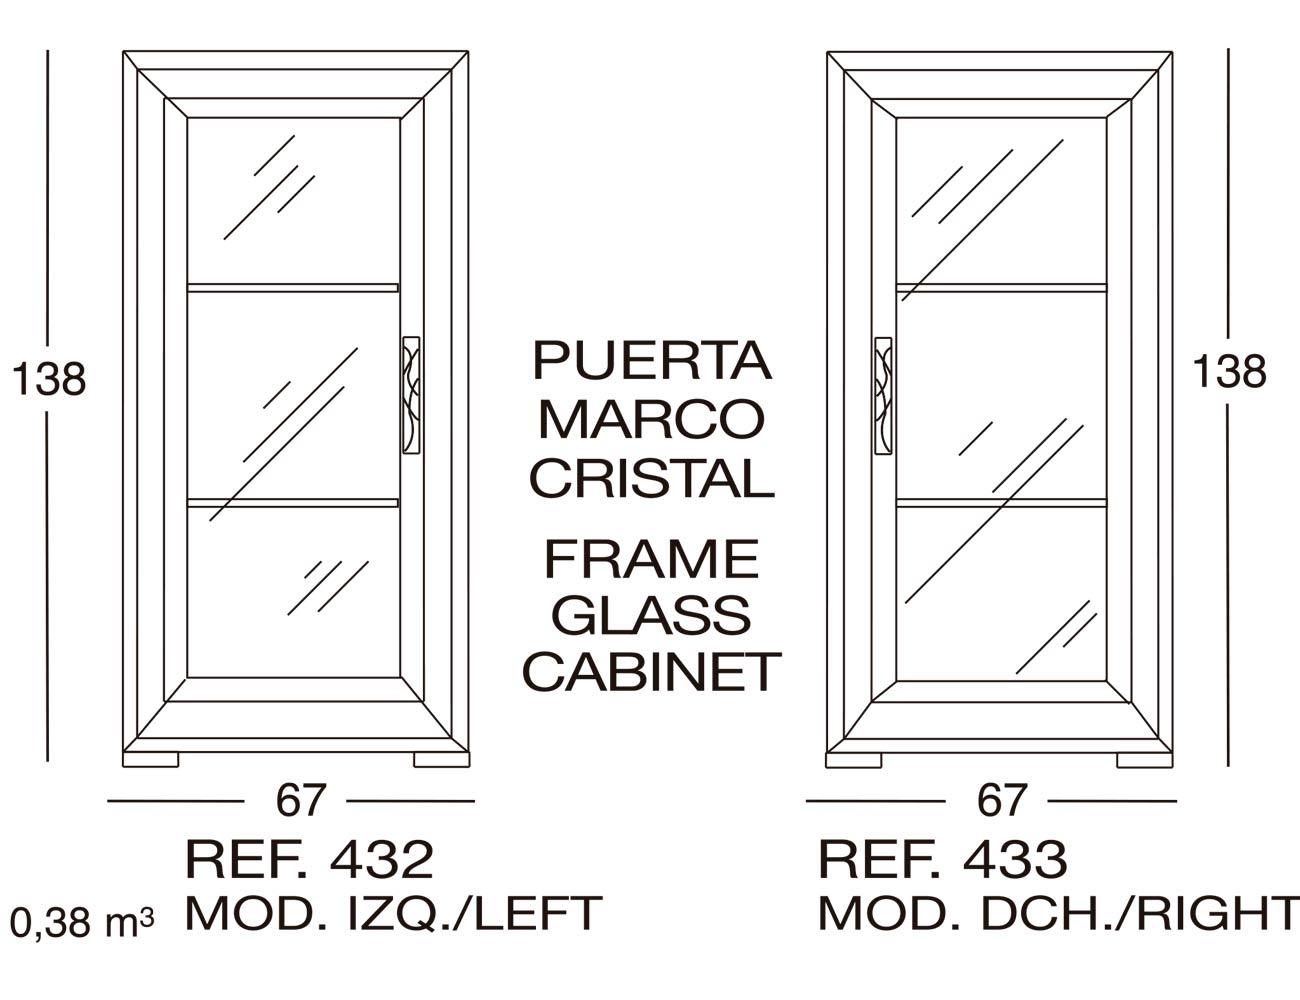 Modulo izdo puerta marco cristal 4321